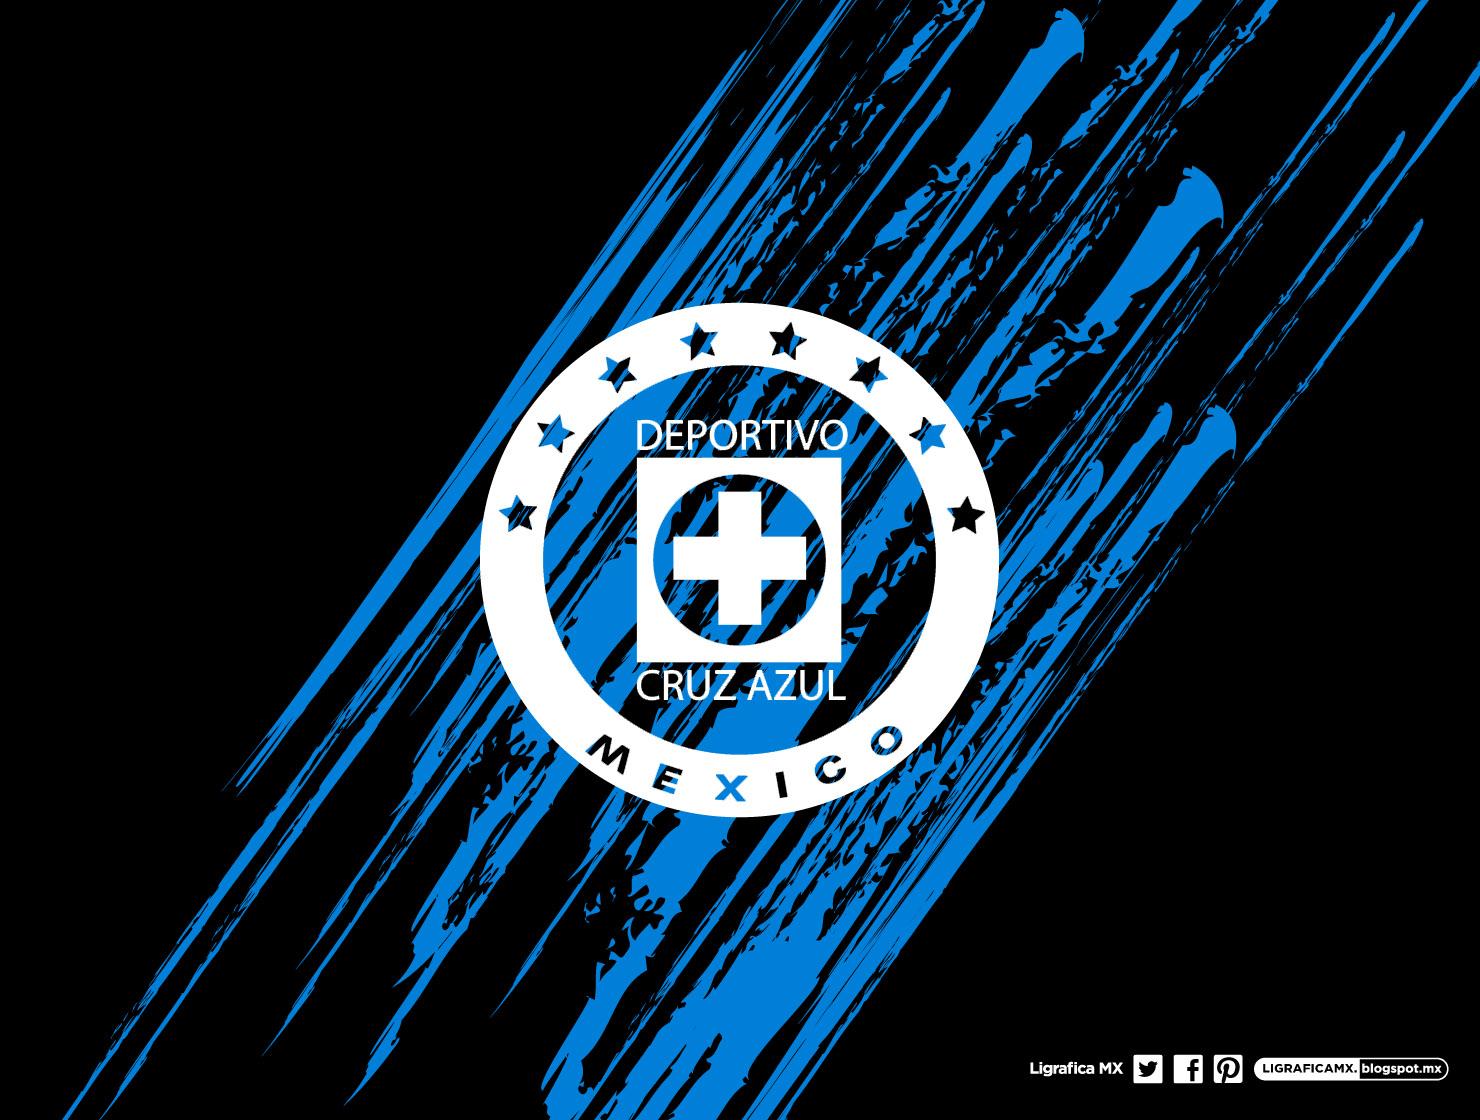 Club America Wallpapers 3d Ligrafica Mx Wallpapers 03092013ctg 3